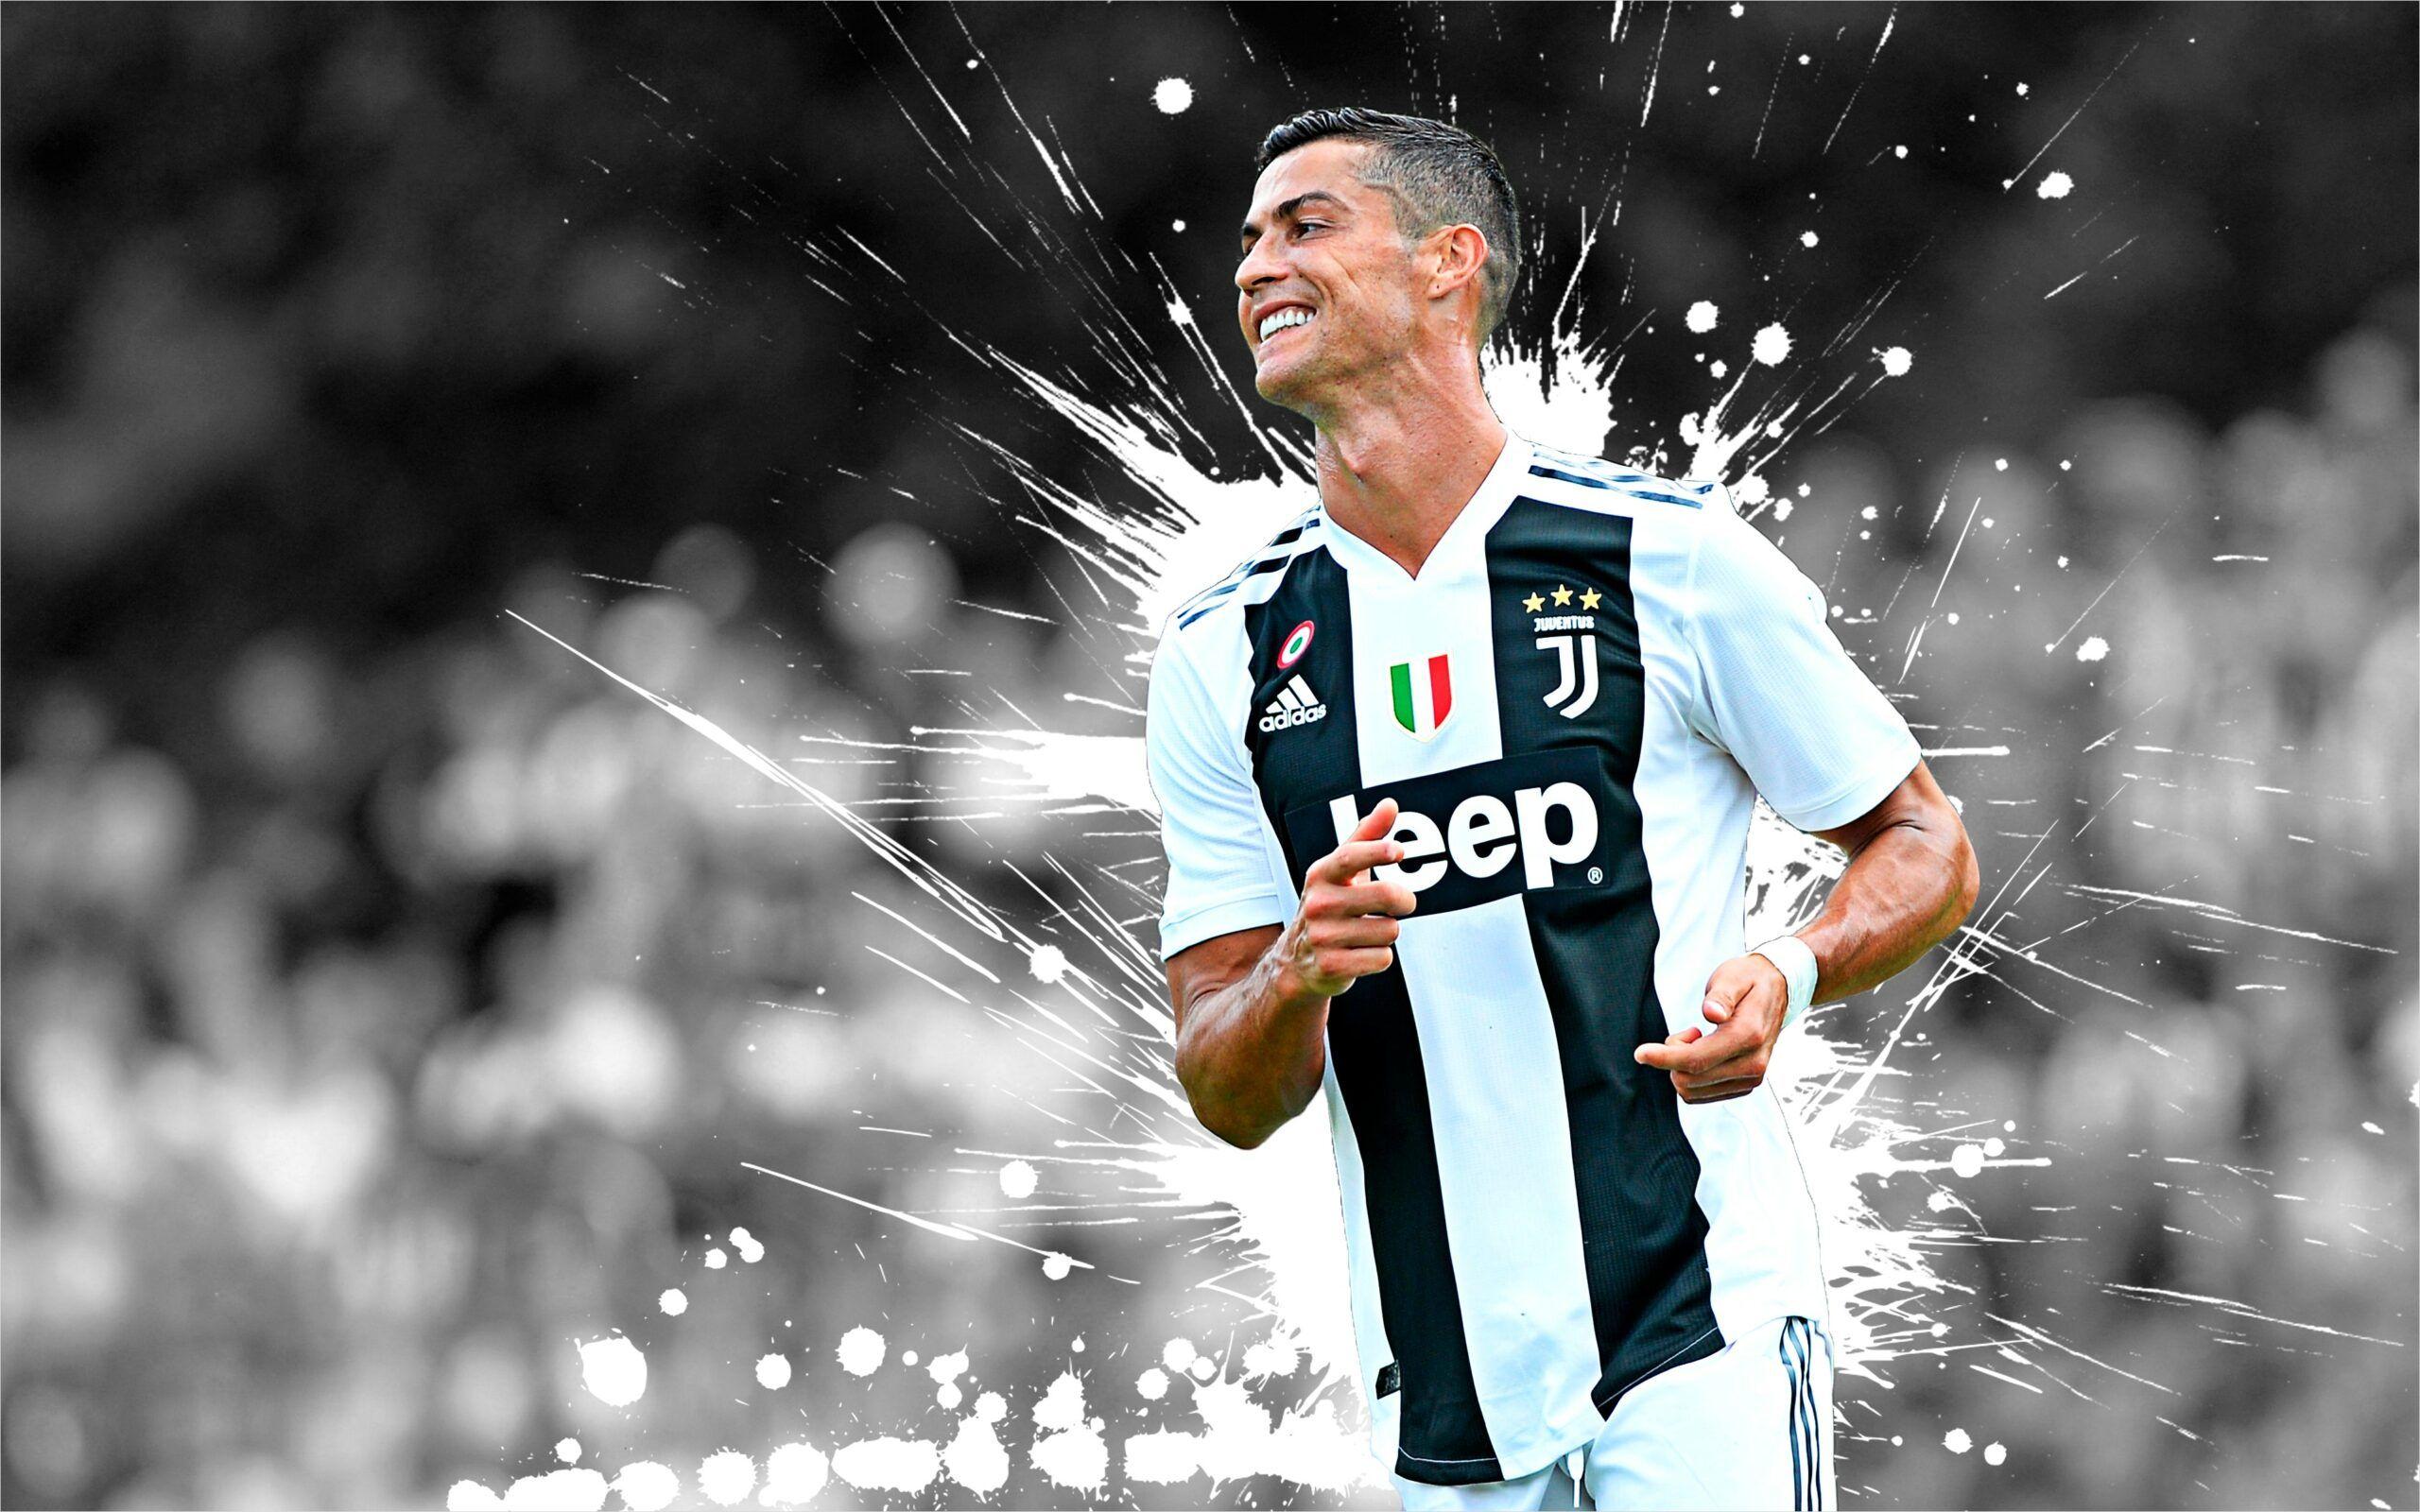 Cristiano Ronaldo 4k Wallpaper In 2020 With Images Cristiano